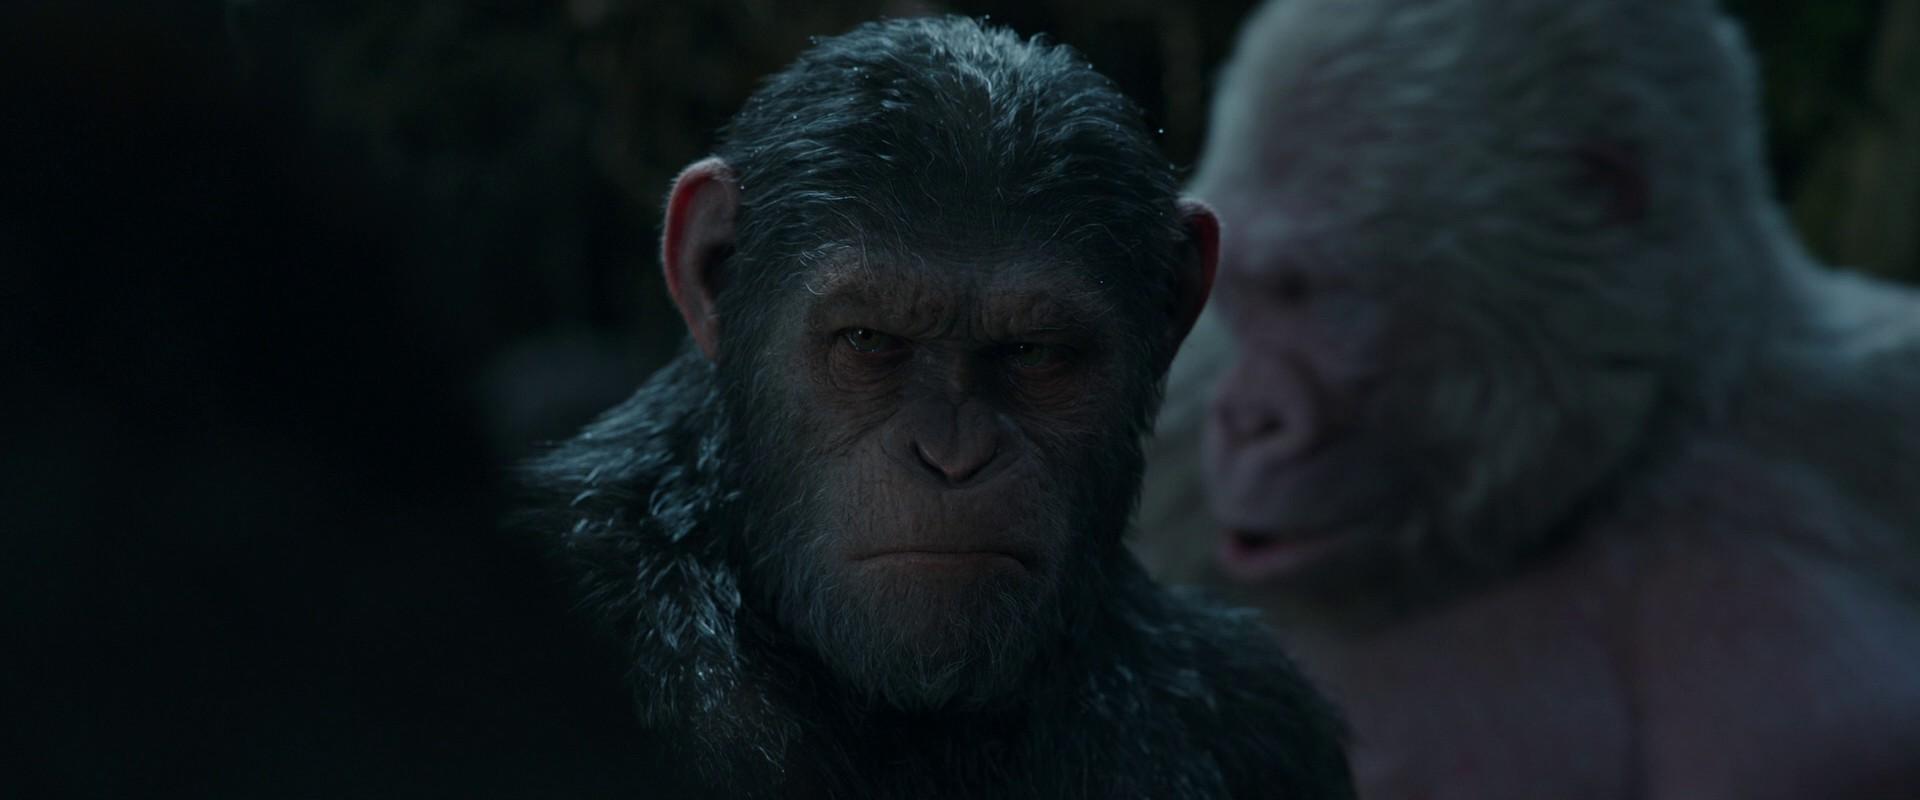 Планета обезьян: Война / War for the Planet of the Apes (2017) BDRip 1080p